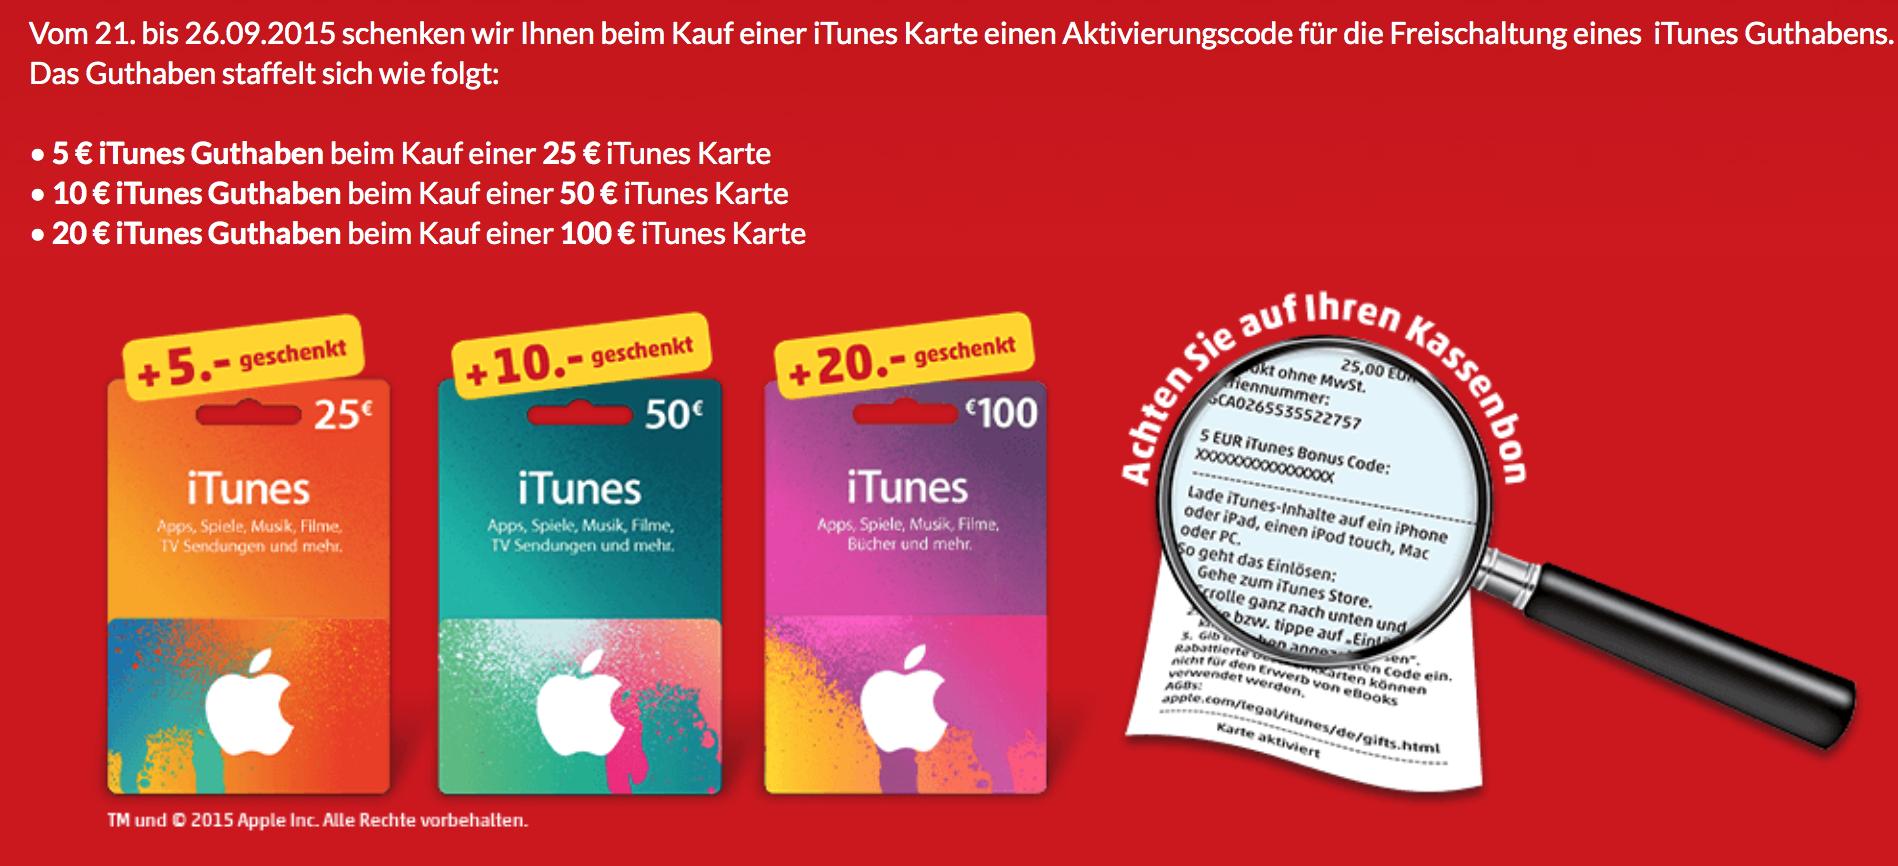 Wo gibt es iTunes-Karten verbilligt?-bildschirmfoto-2015-09-20-um-12.27.19.png